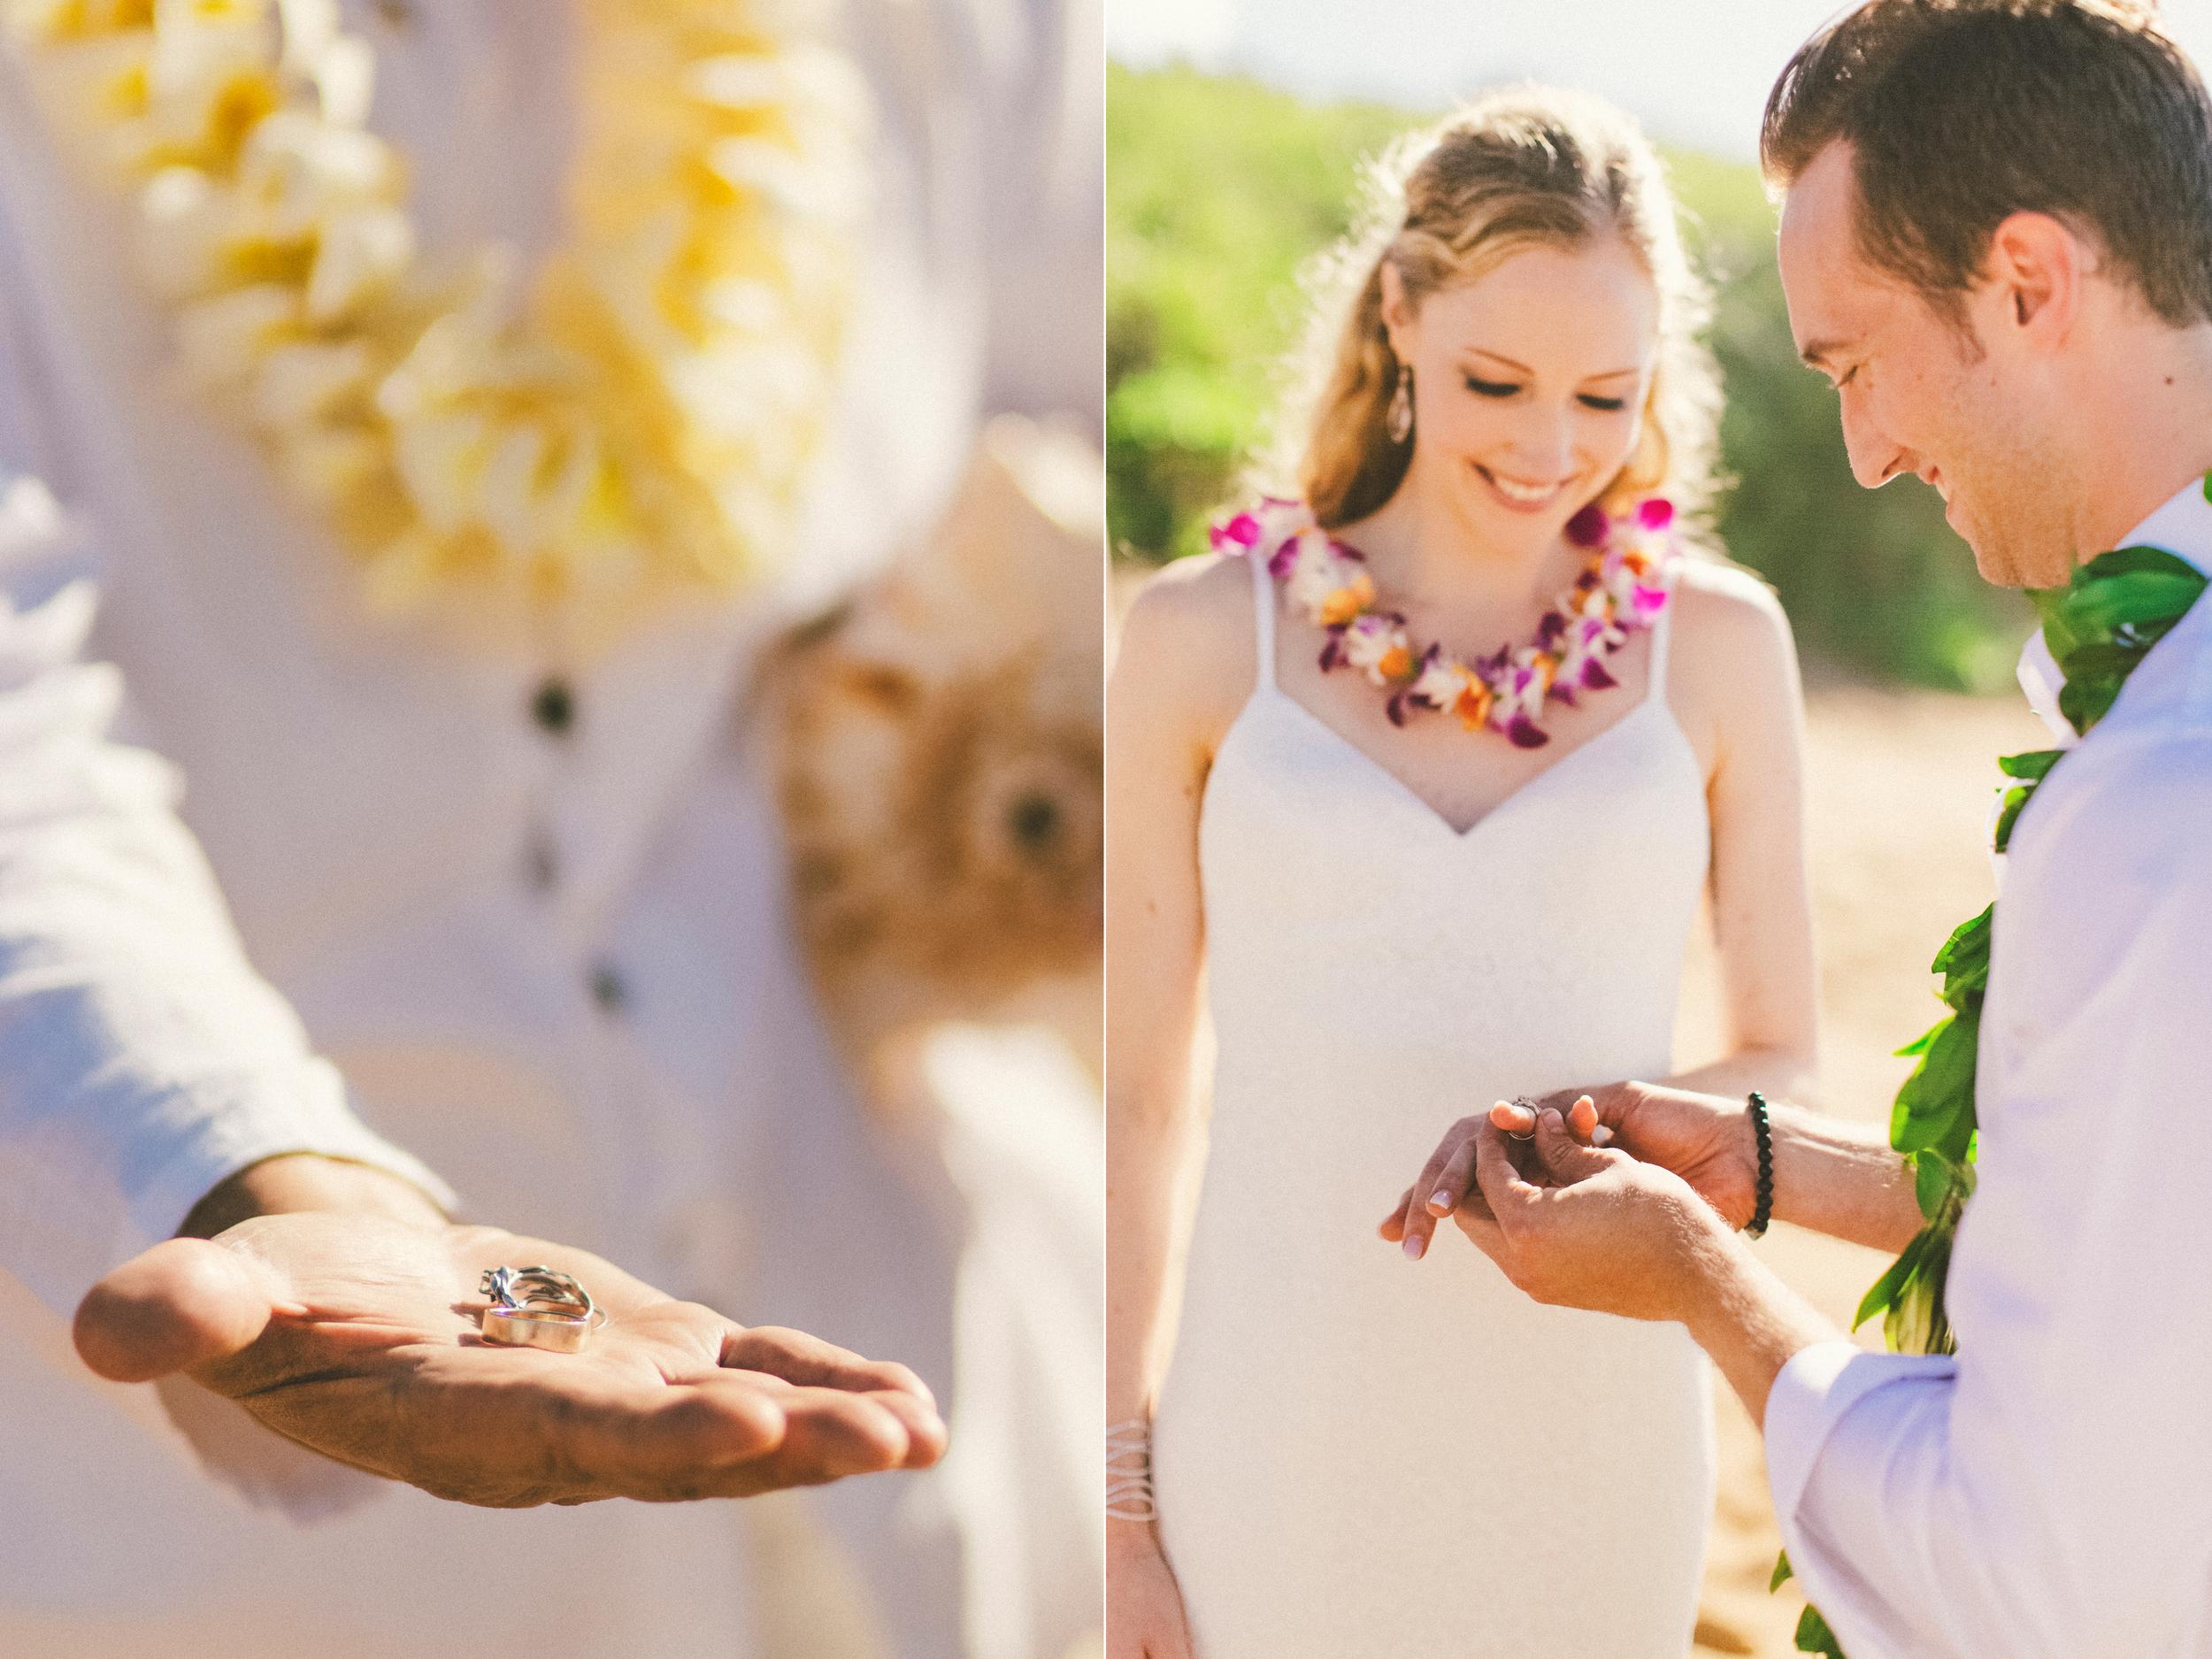 angie-diaz-photography-maui-wedding-60.jpg